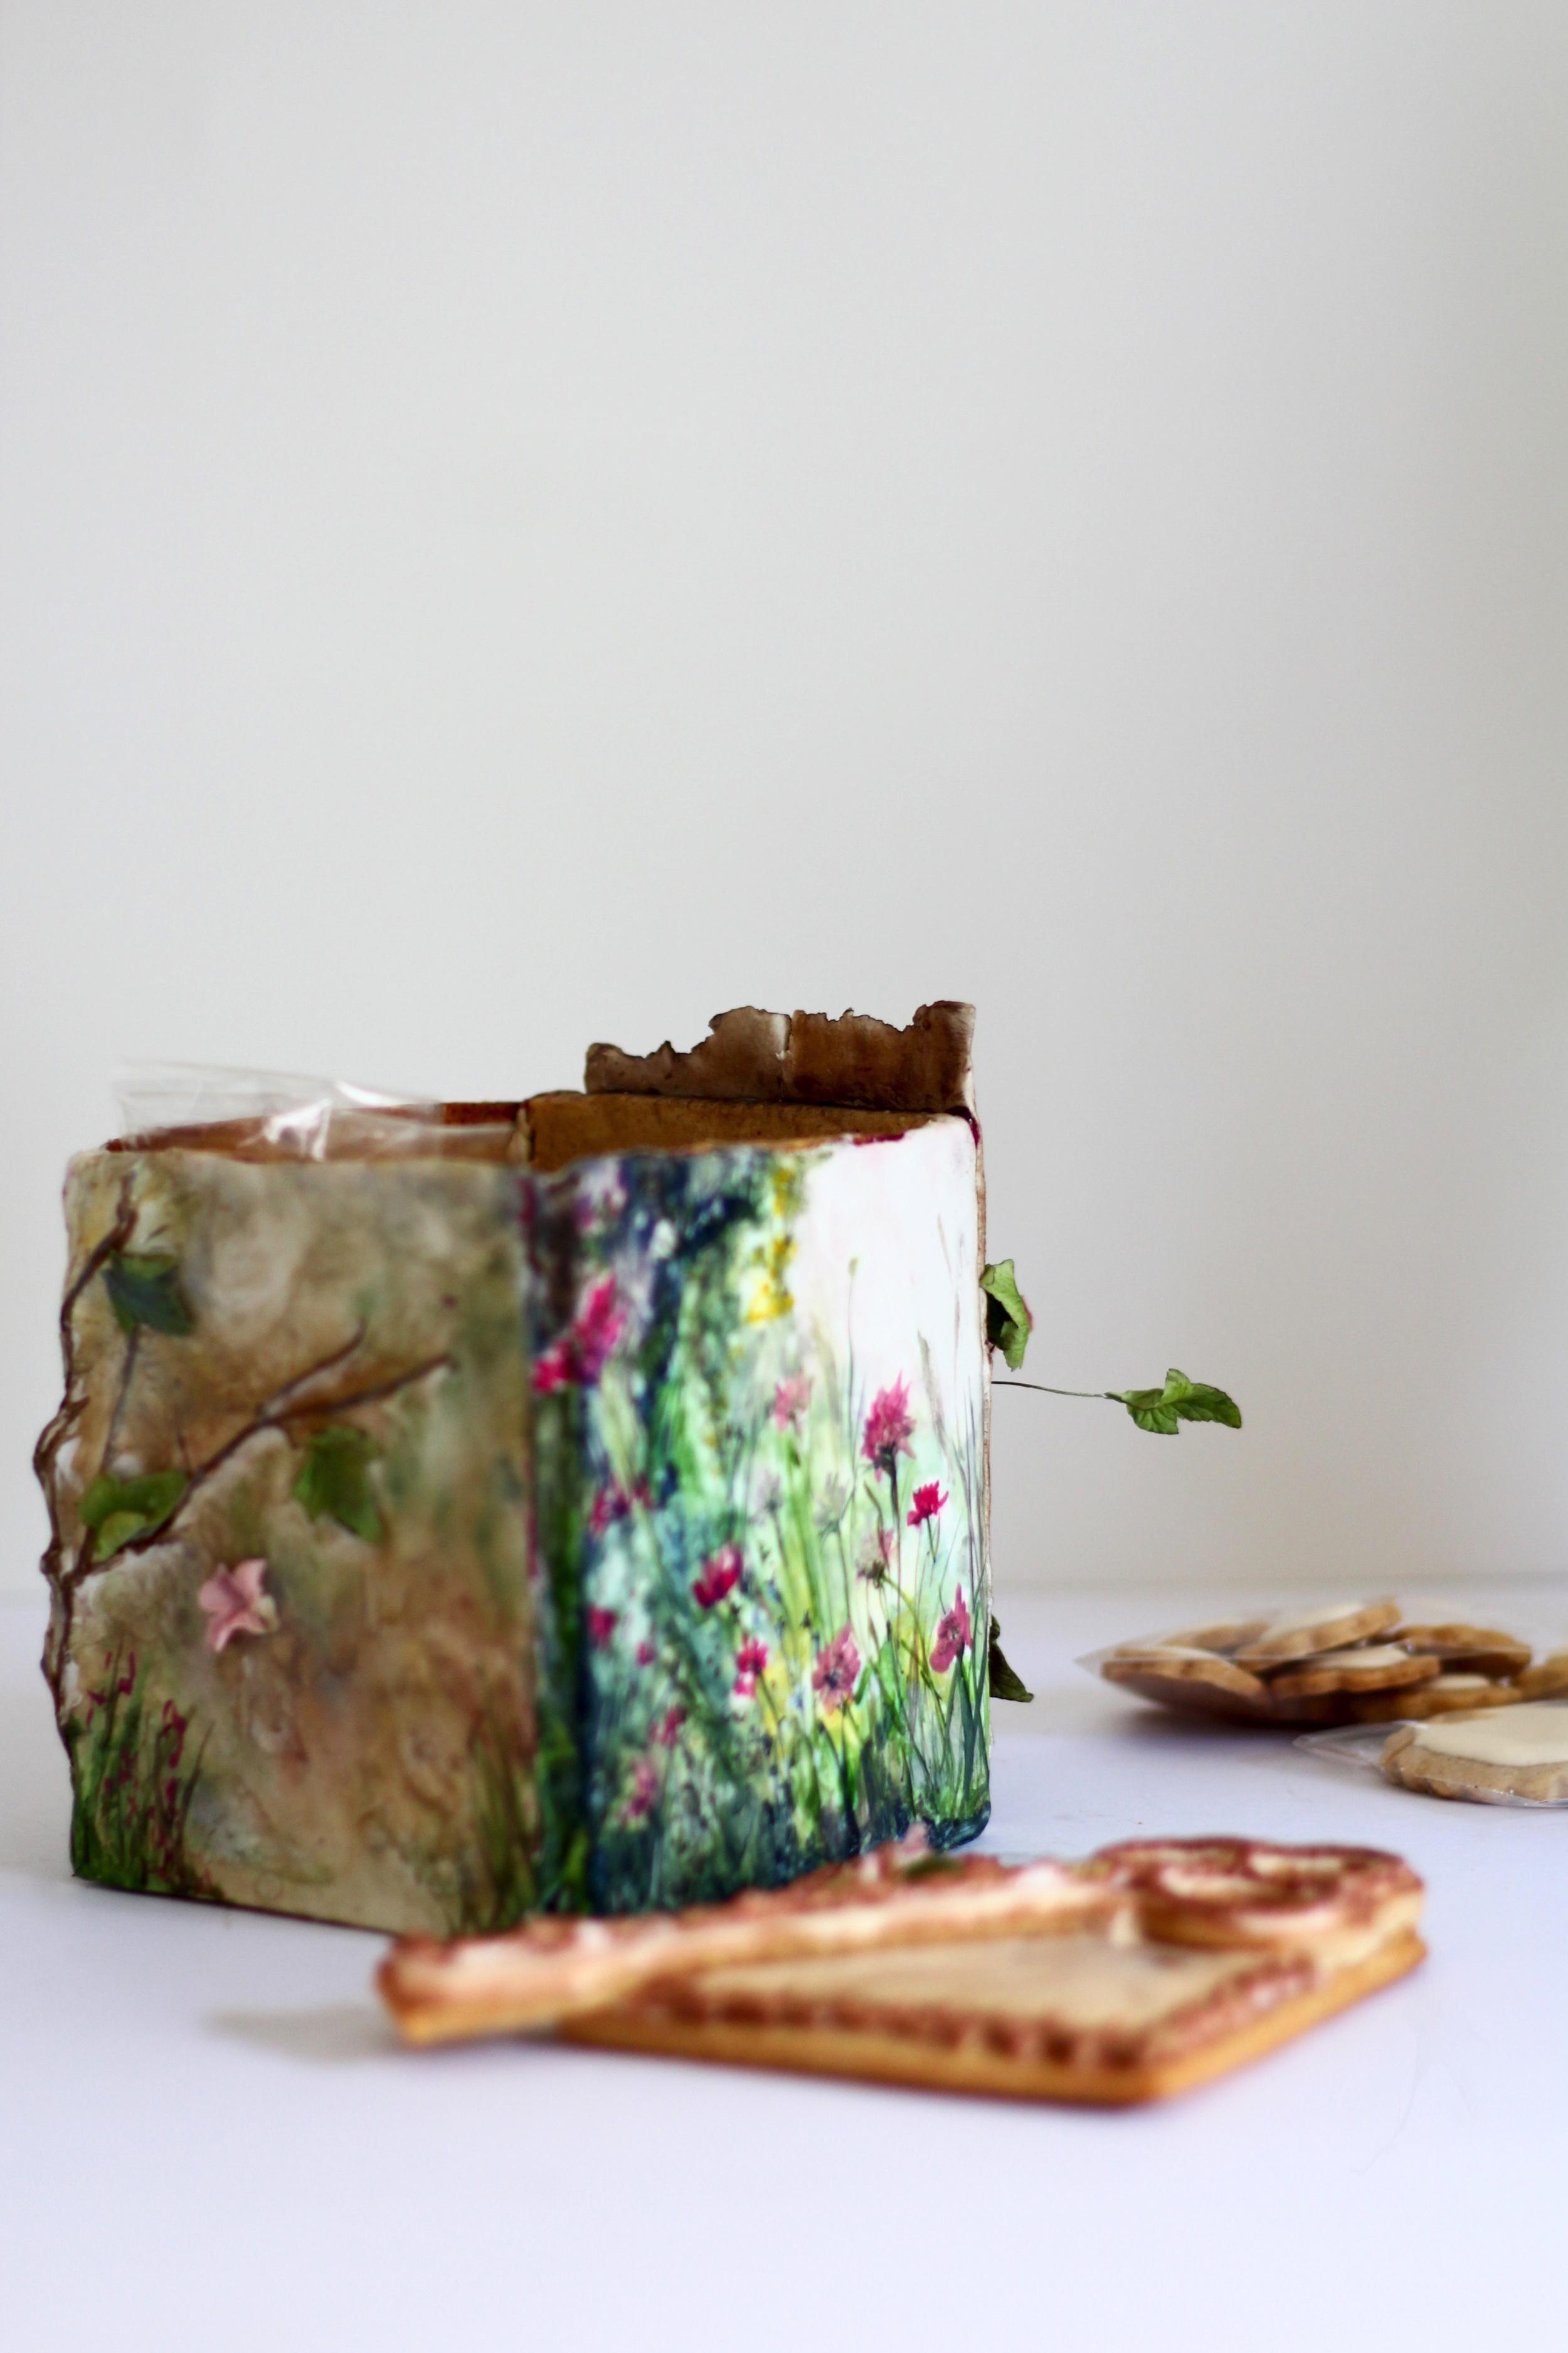 jaime gerard cake secret garden cookie.jpg